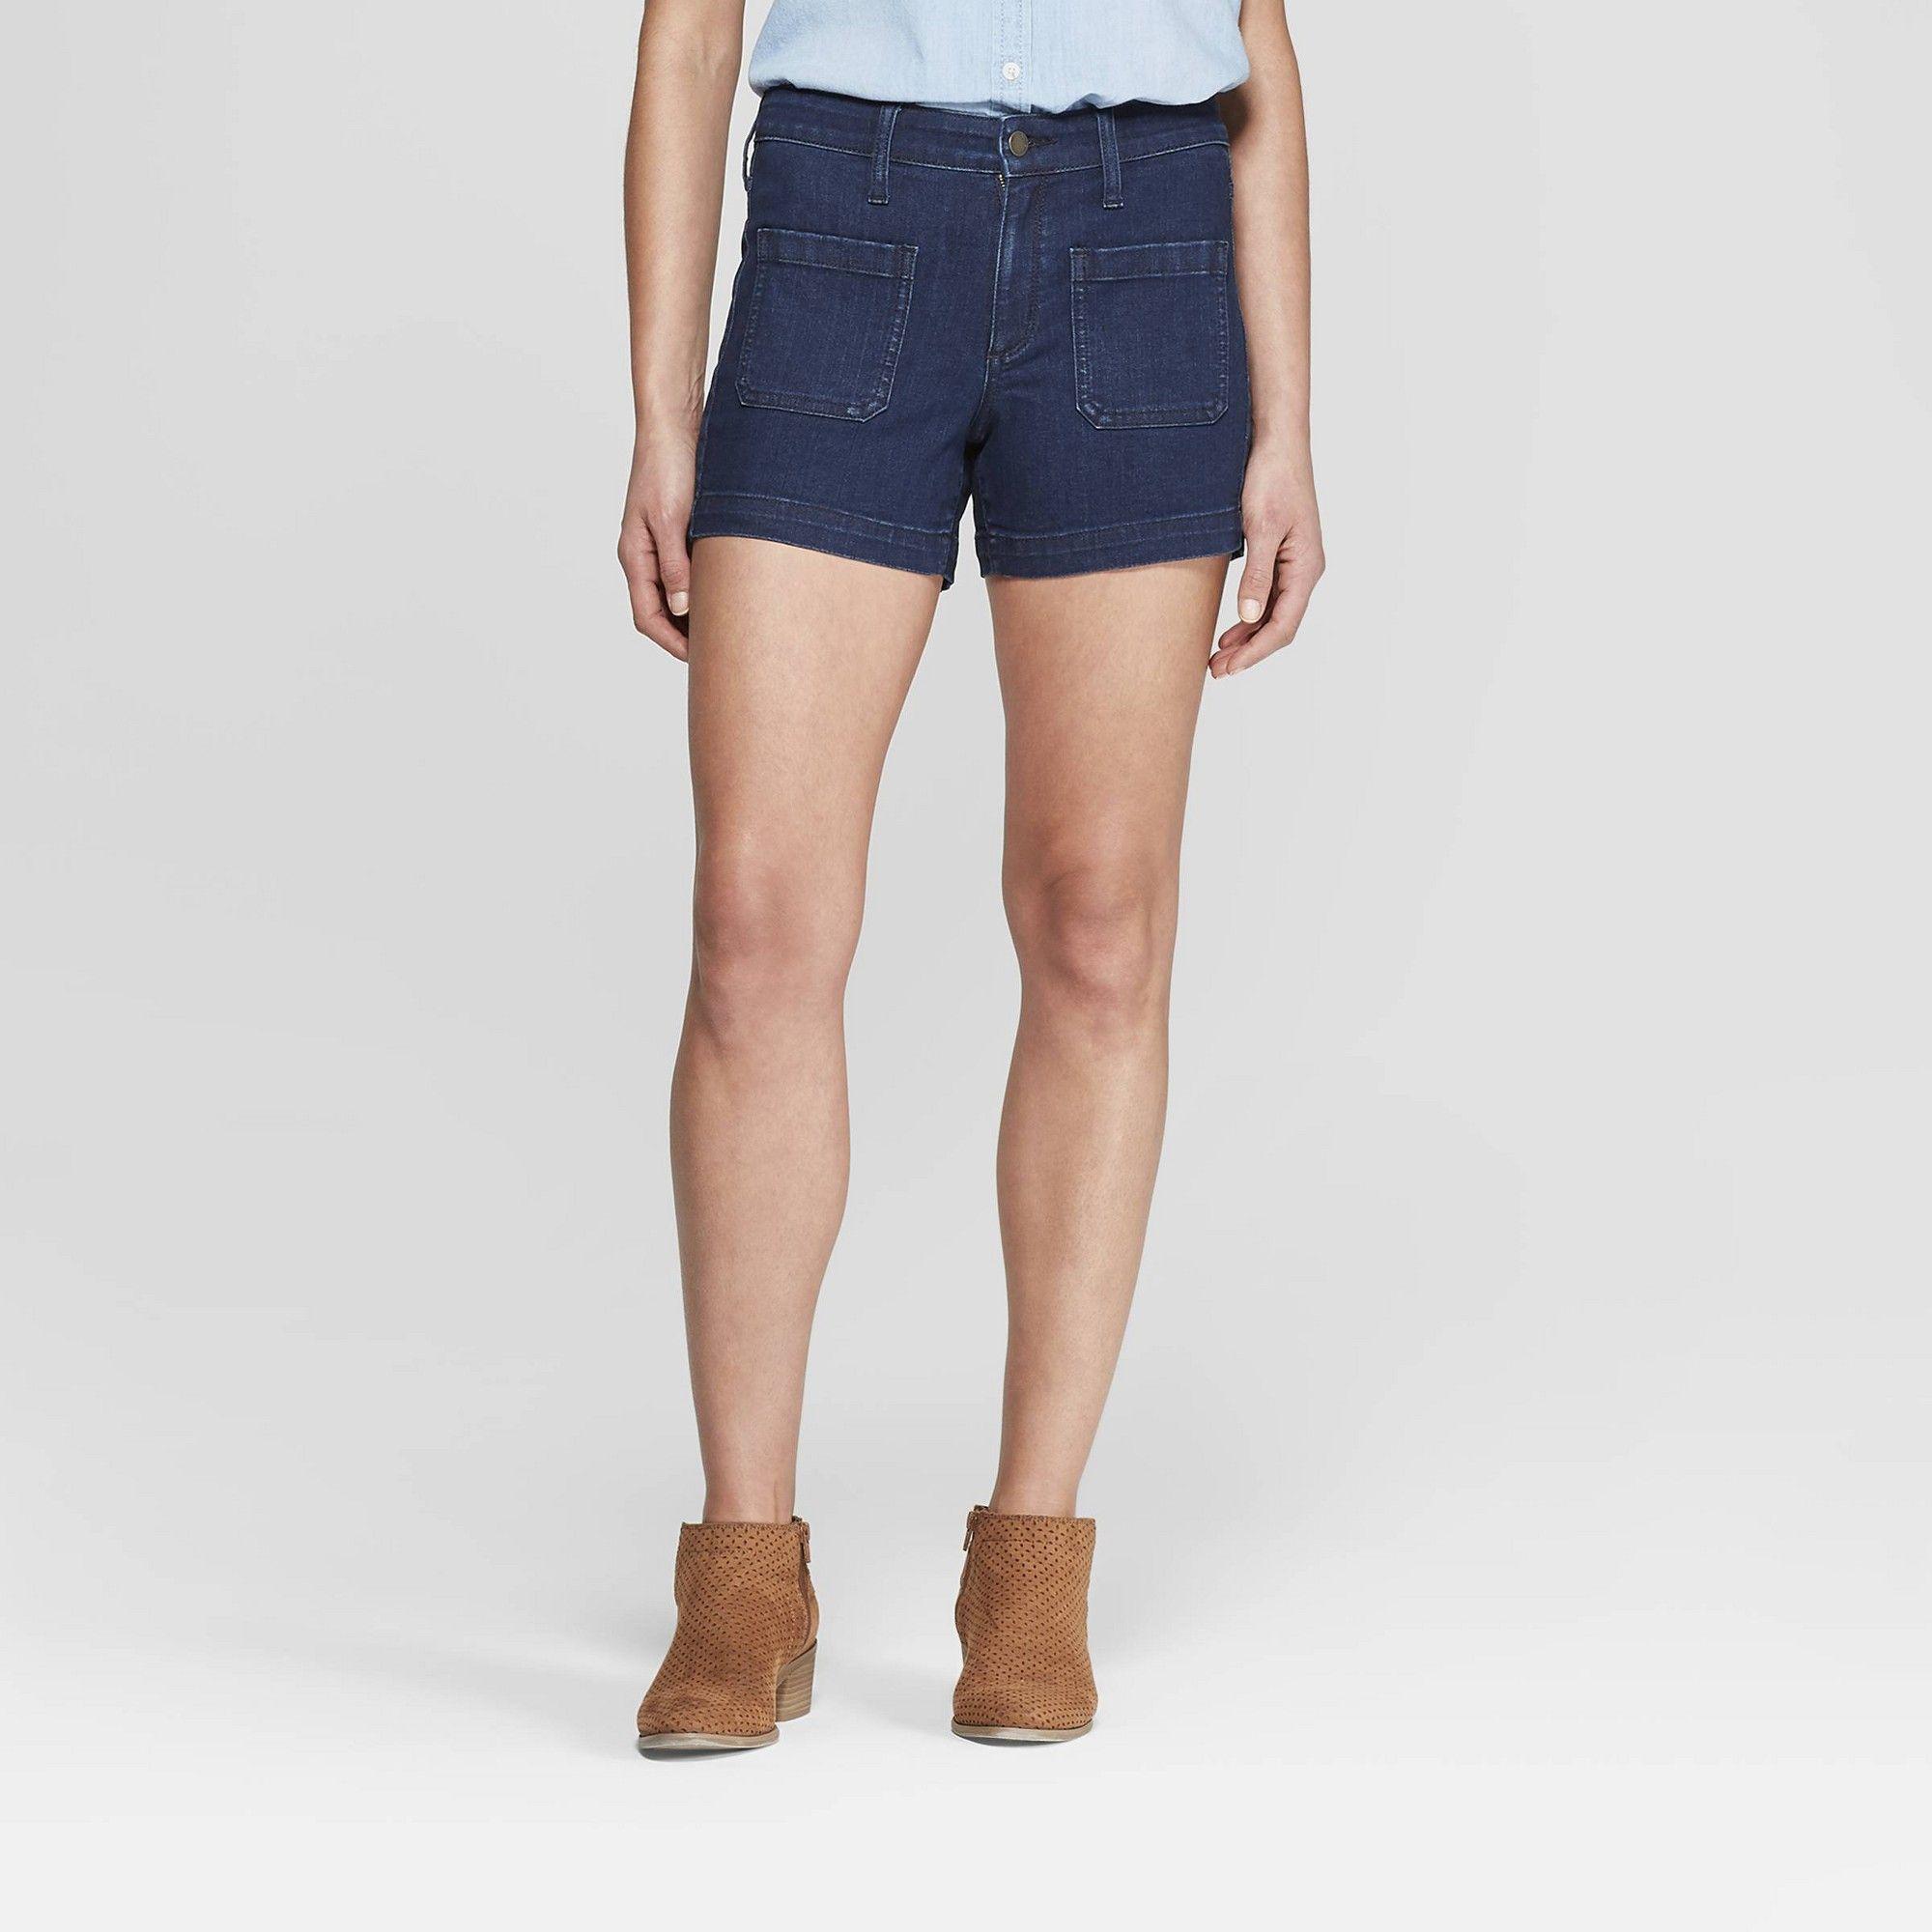 Universal Thread Women/'s Stretch High-Rise Midi Jean Shorts